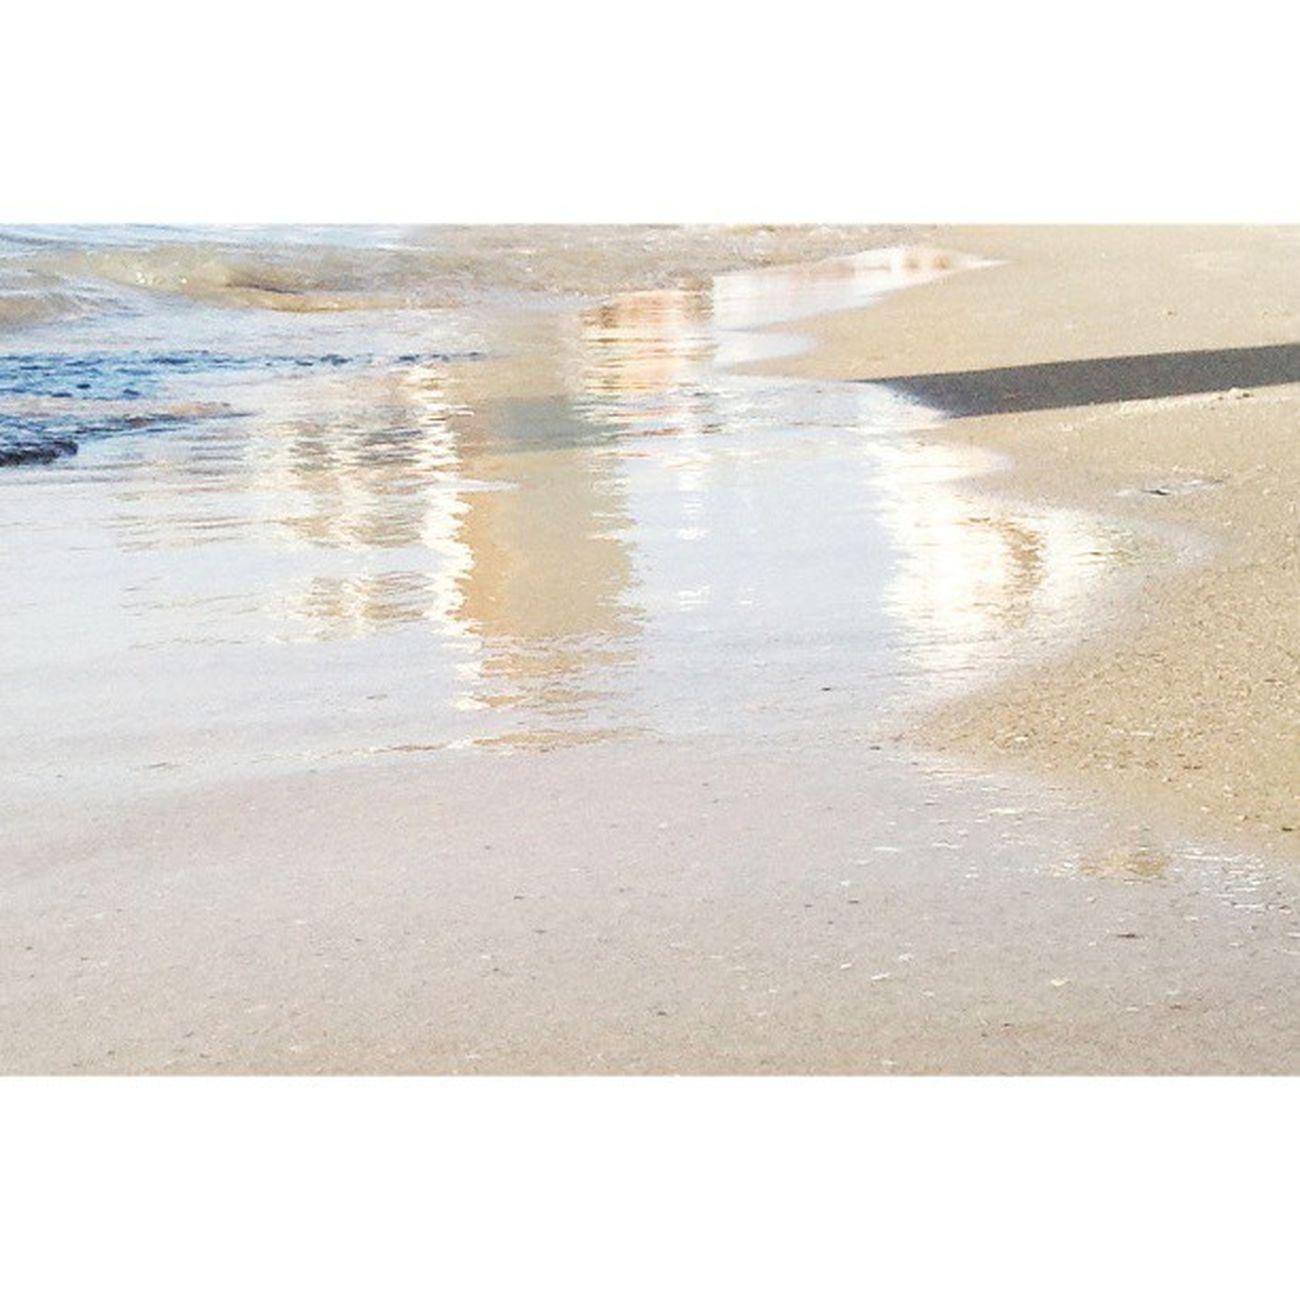 Seashore Beach Bestnatureshots Bestofisrael igminimal ig_israel igersisrael il_instagram pic_israel picoftheday hapitria hot_shotz momentsinthesun ig_photoisrael ig_funinthesun photo_religion keepitsimple gf_israel gf_tlv telavivoftheday insta_israel insta_global instagood